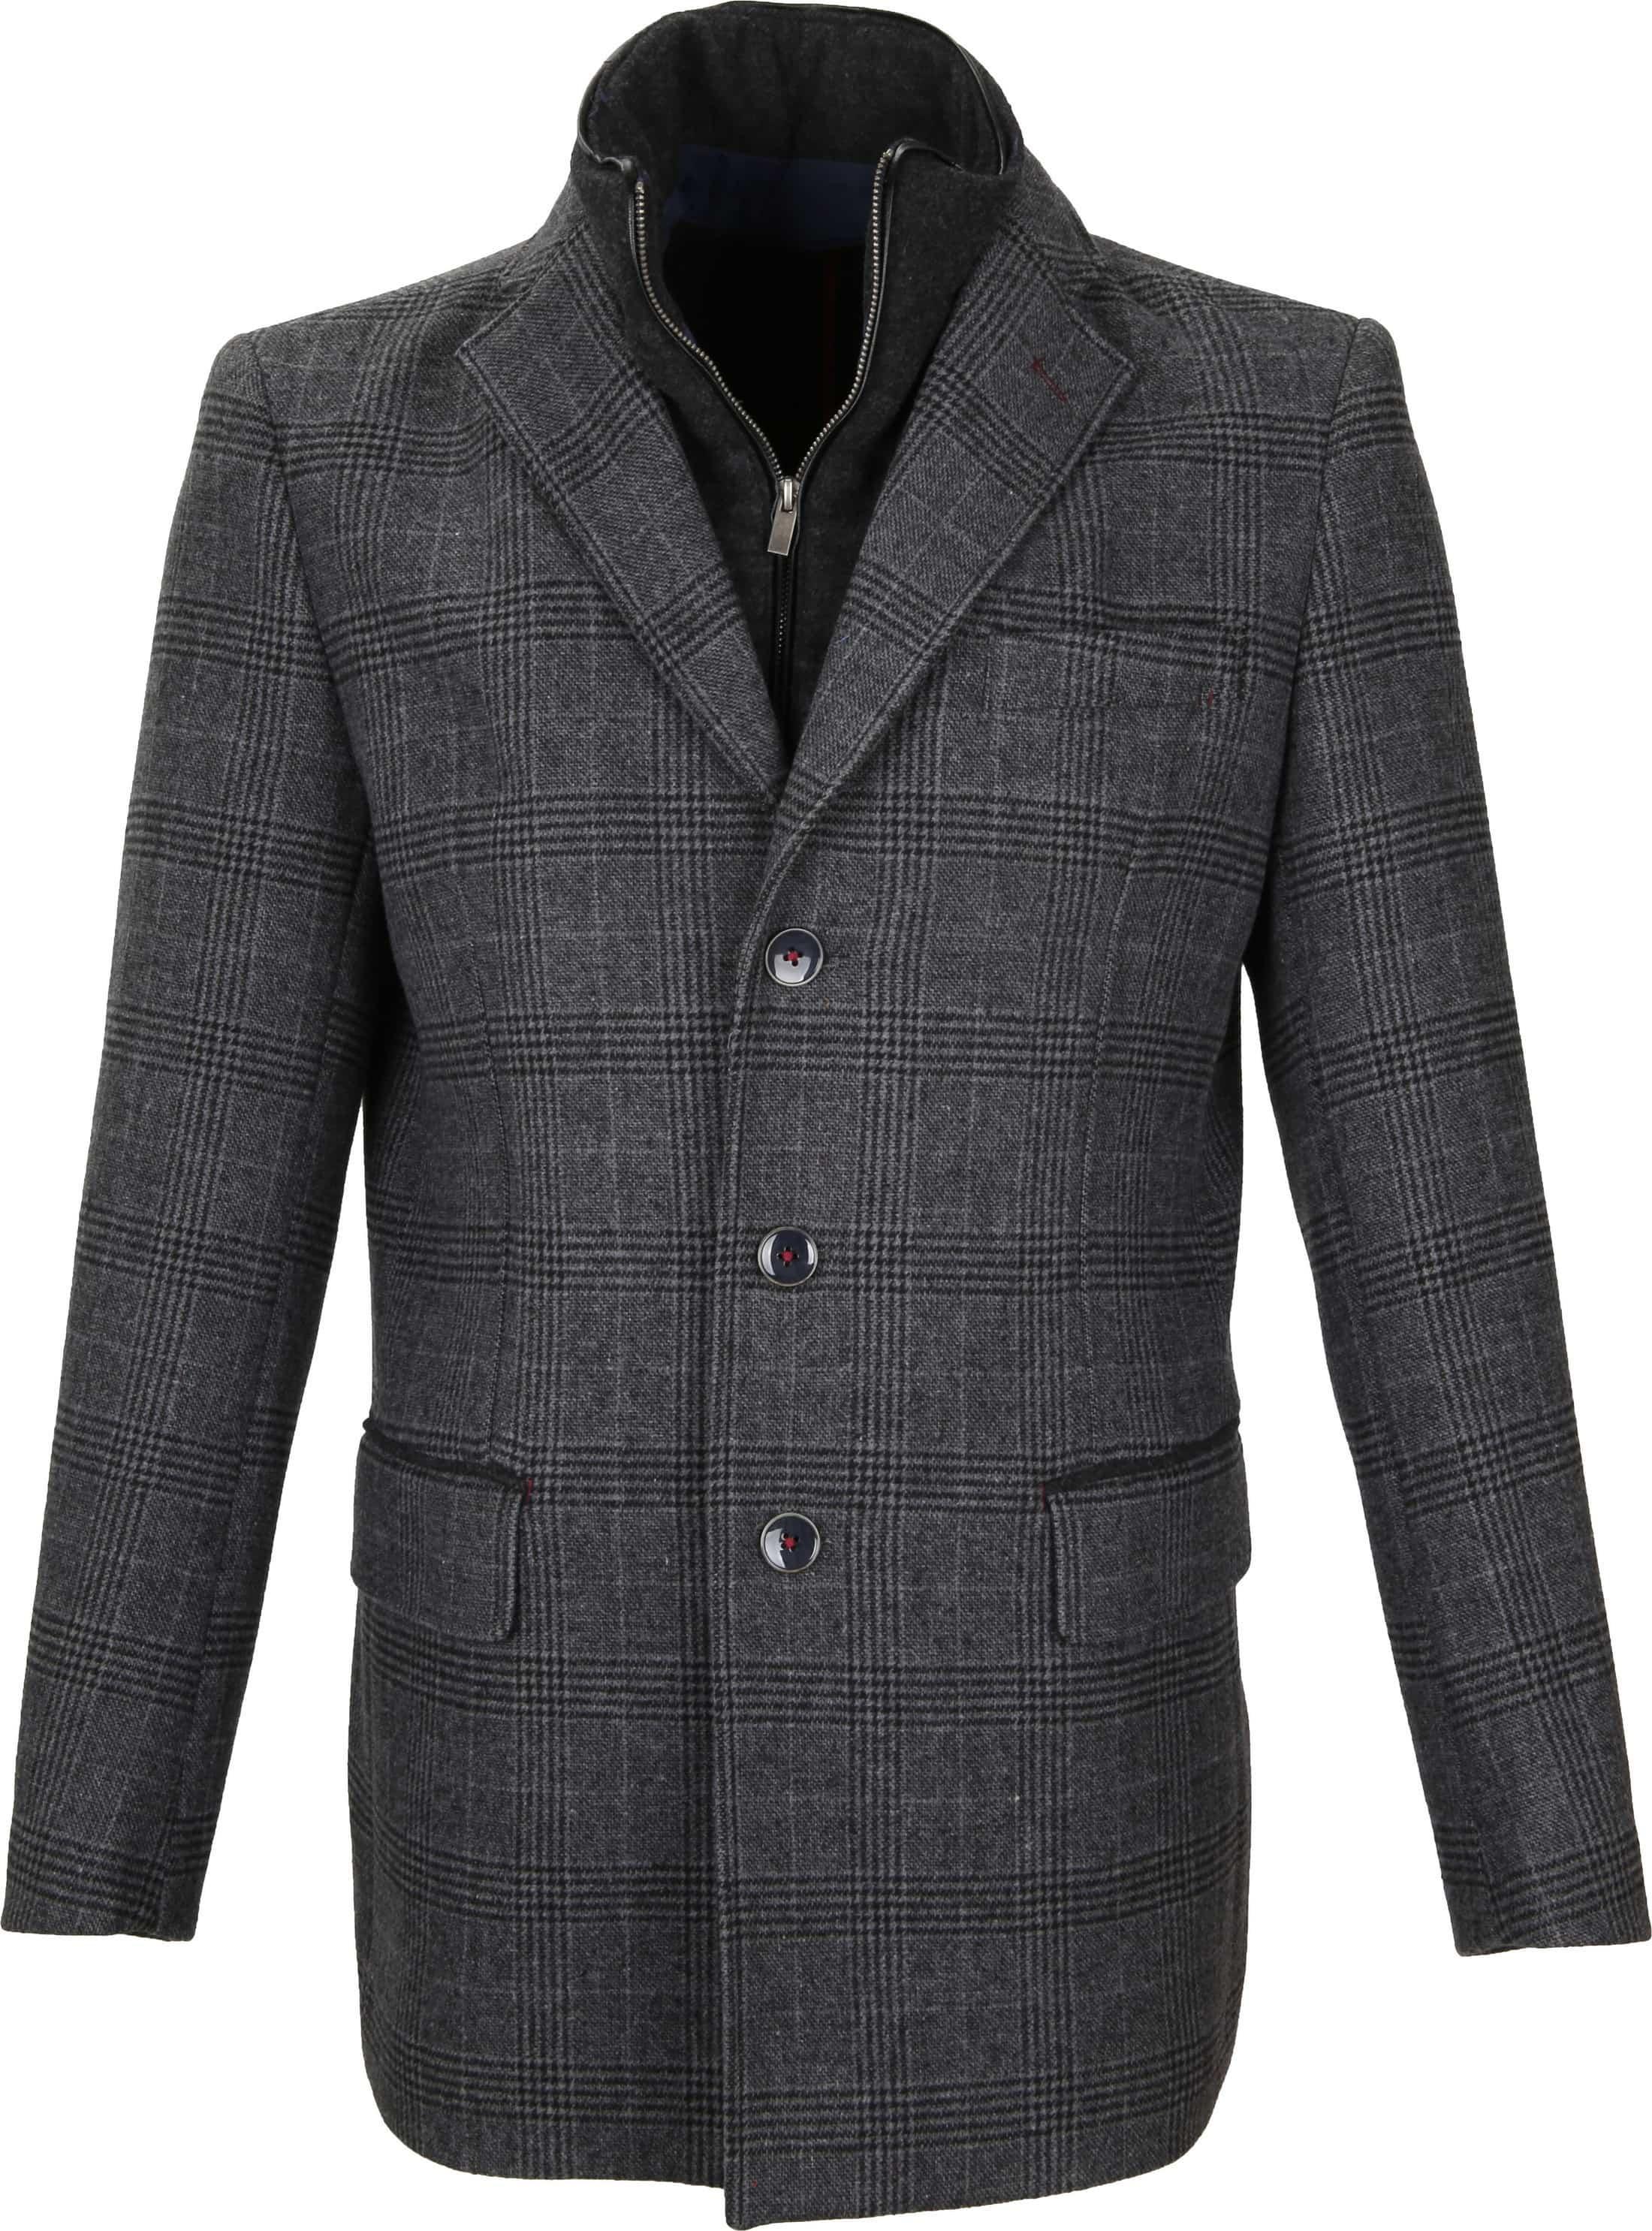 Suitable Coat Anton Antraciet foto 0